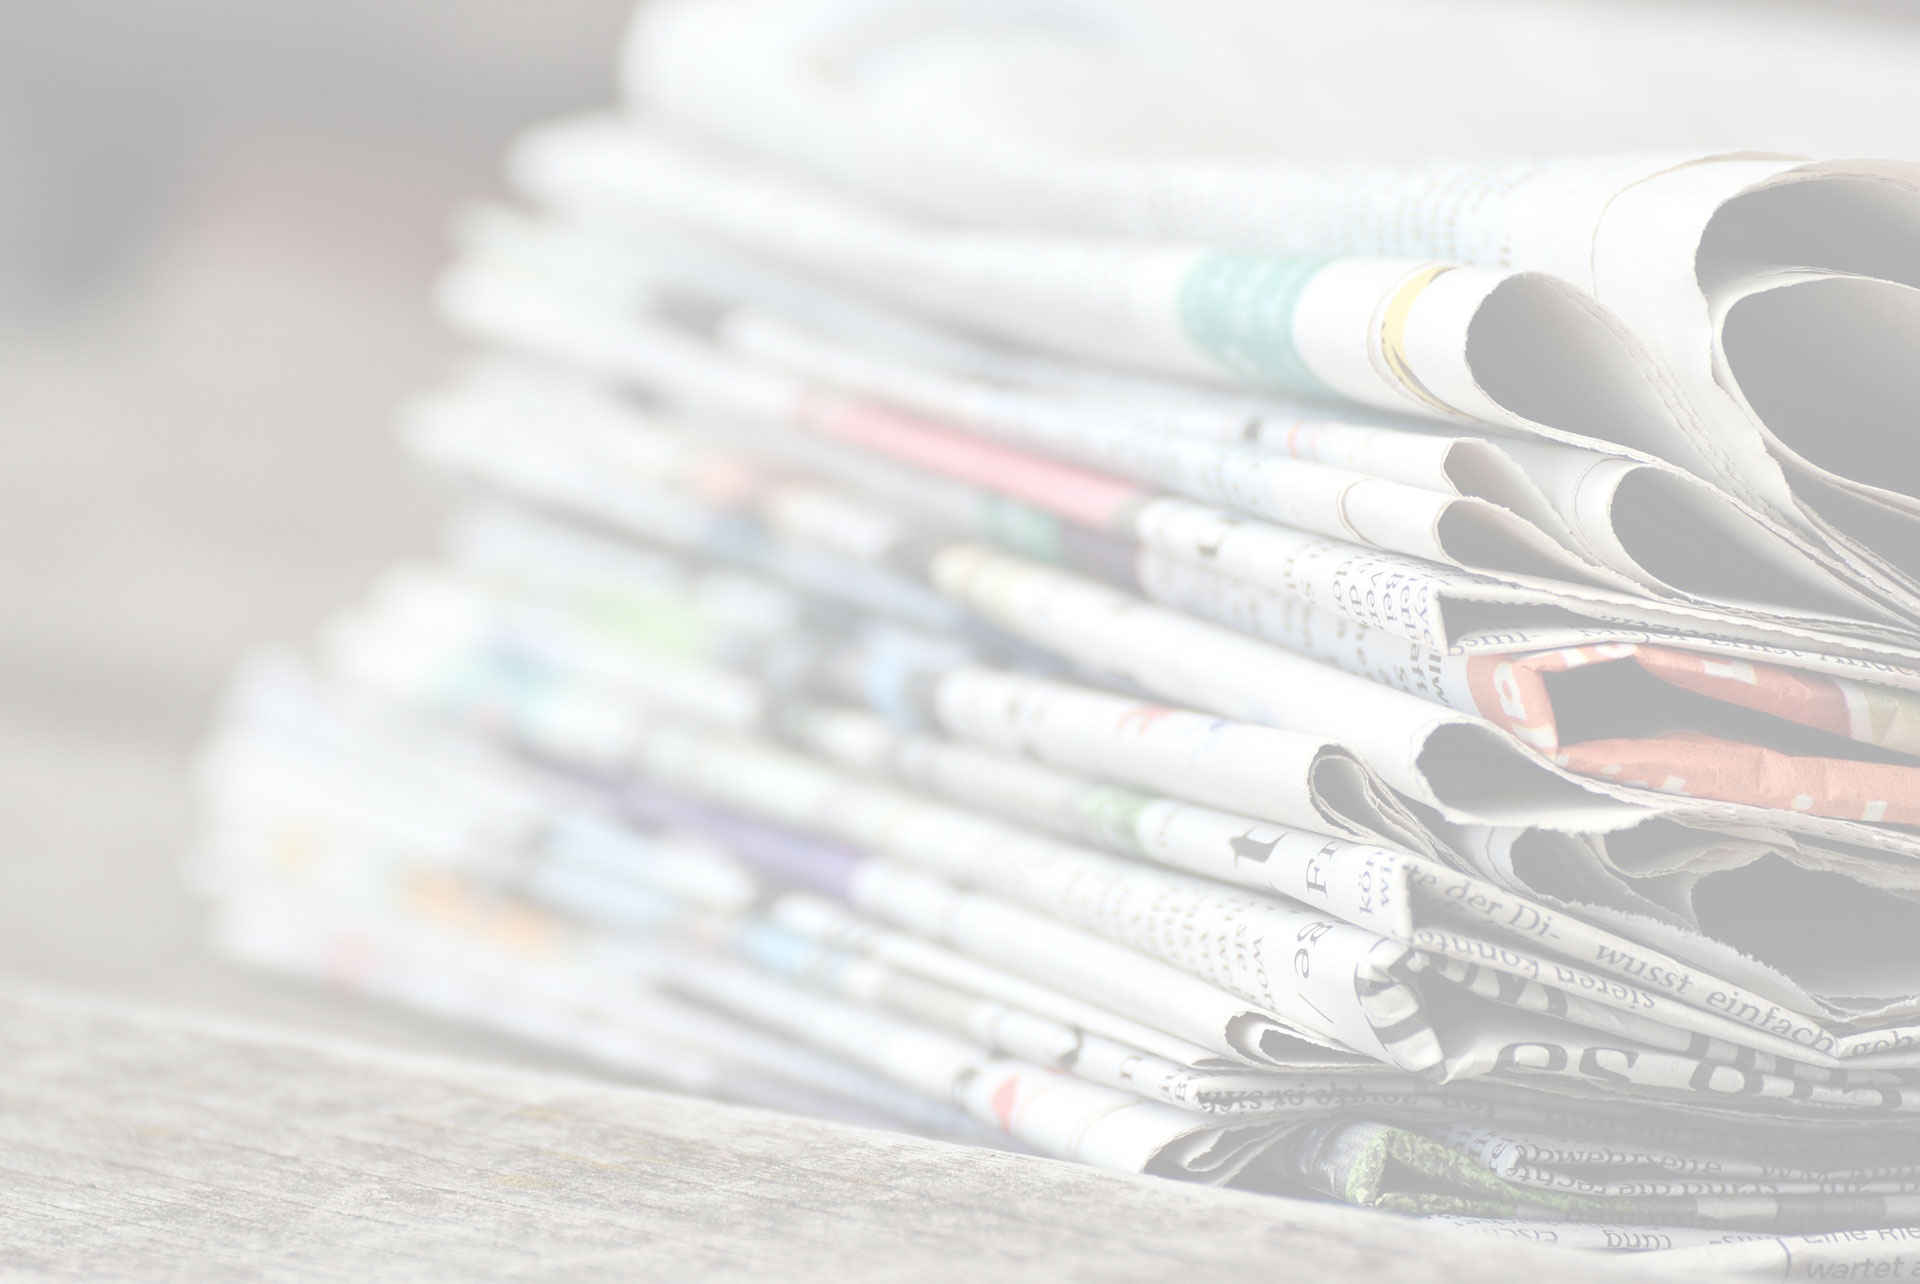 Felice Pulici